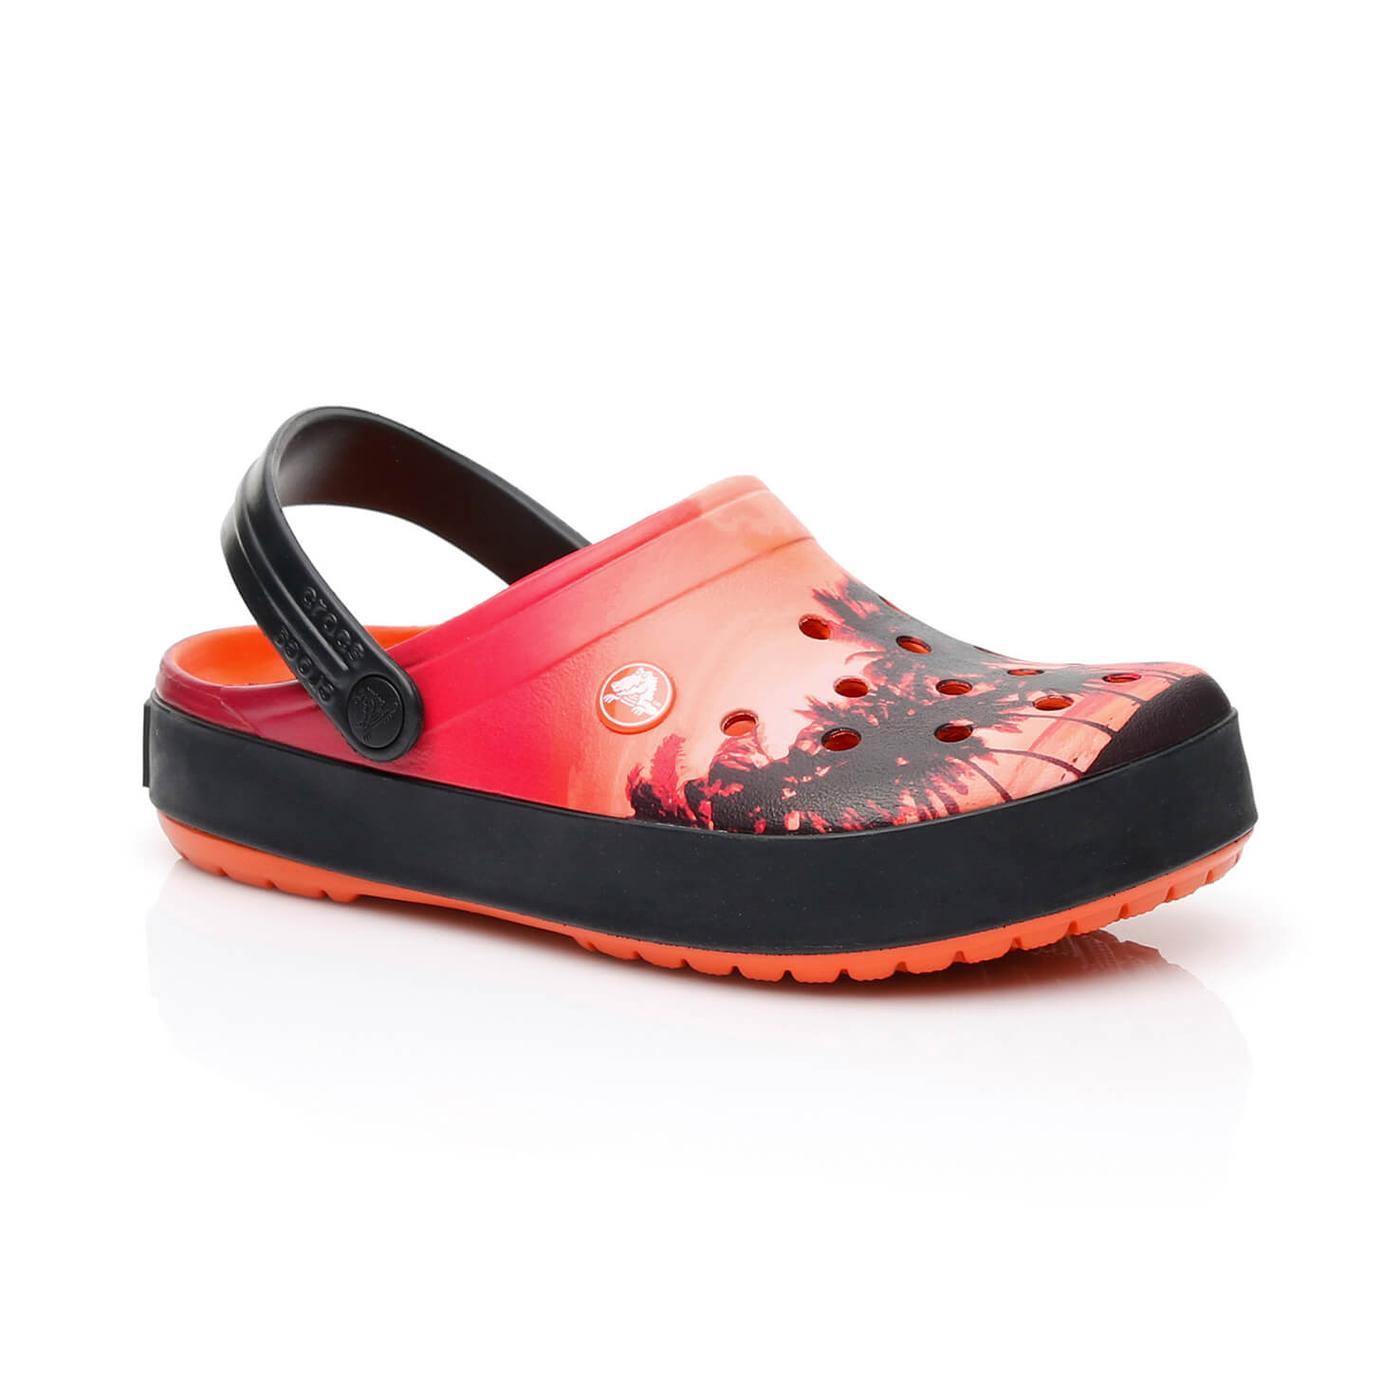 Crocs Crocband Tropics Clog Turuncu Sandalet